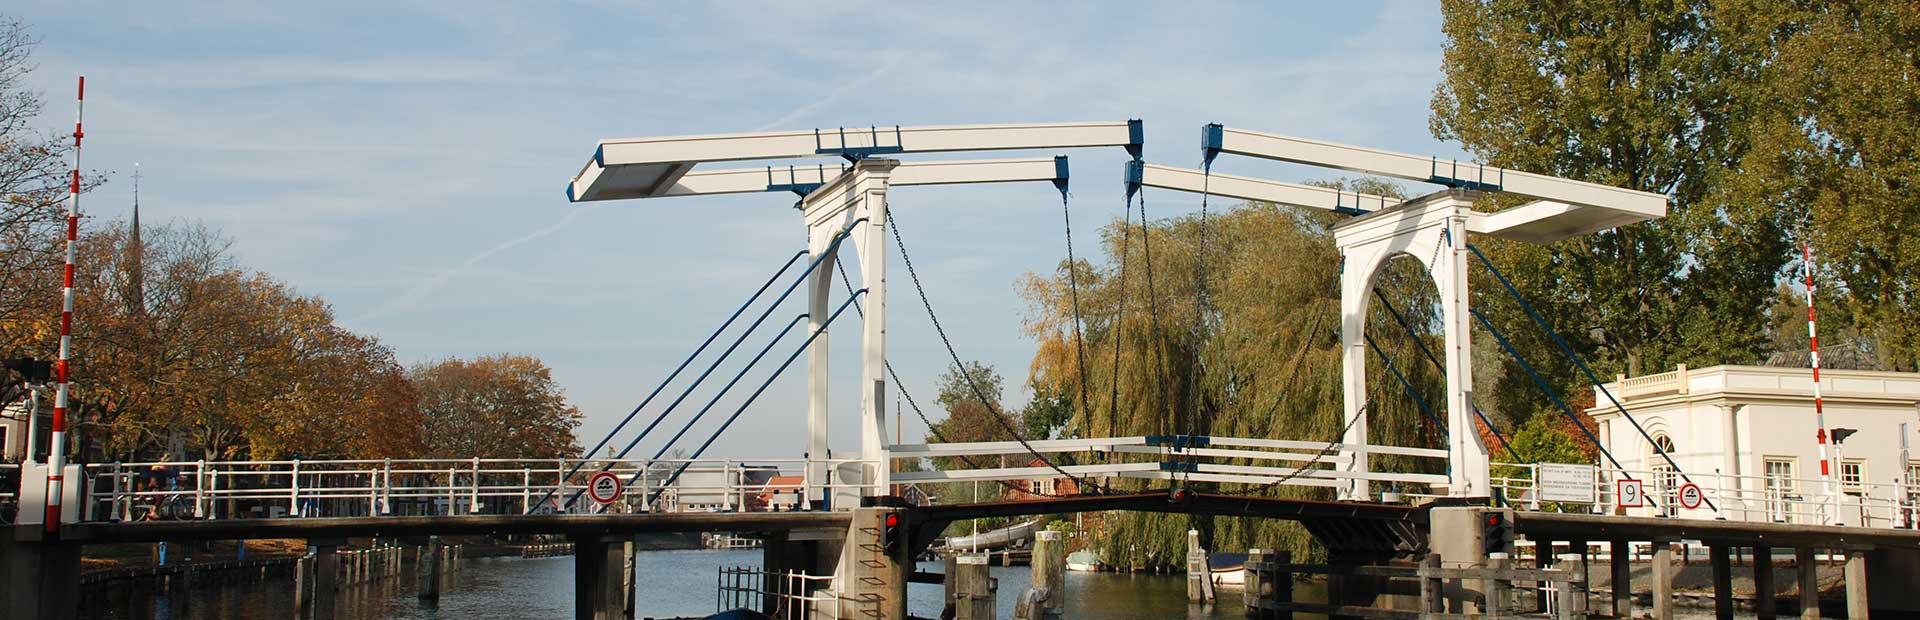 Lange-Vechtbrug-Weesp-Braams-Aannemingsbedrijf